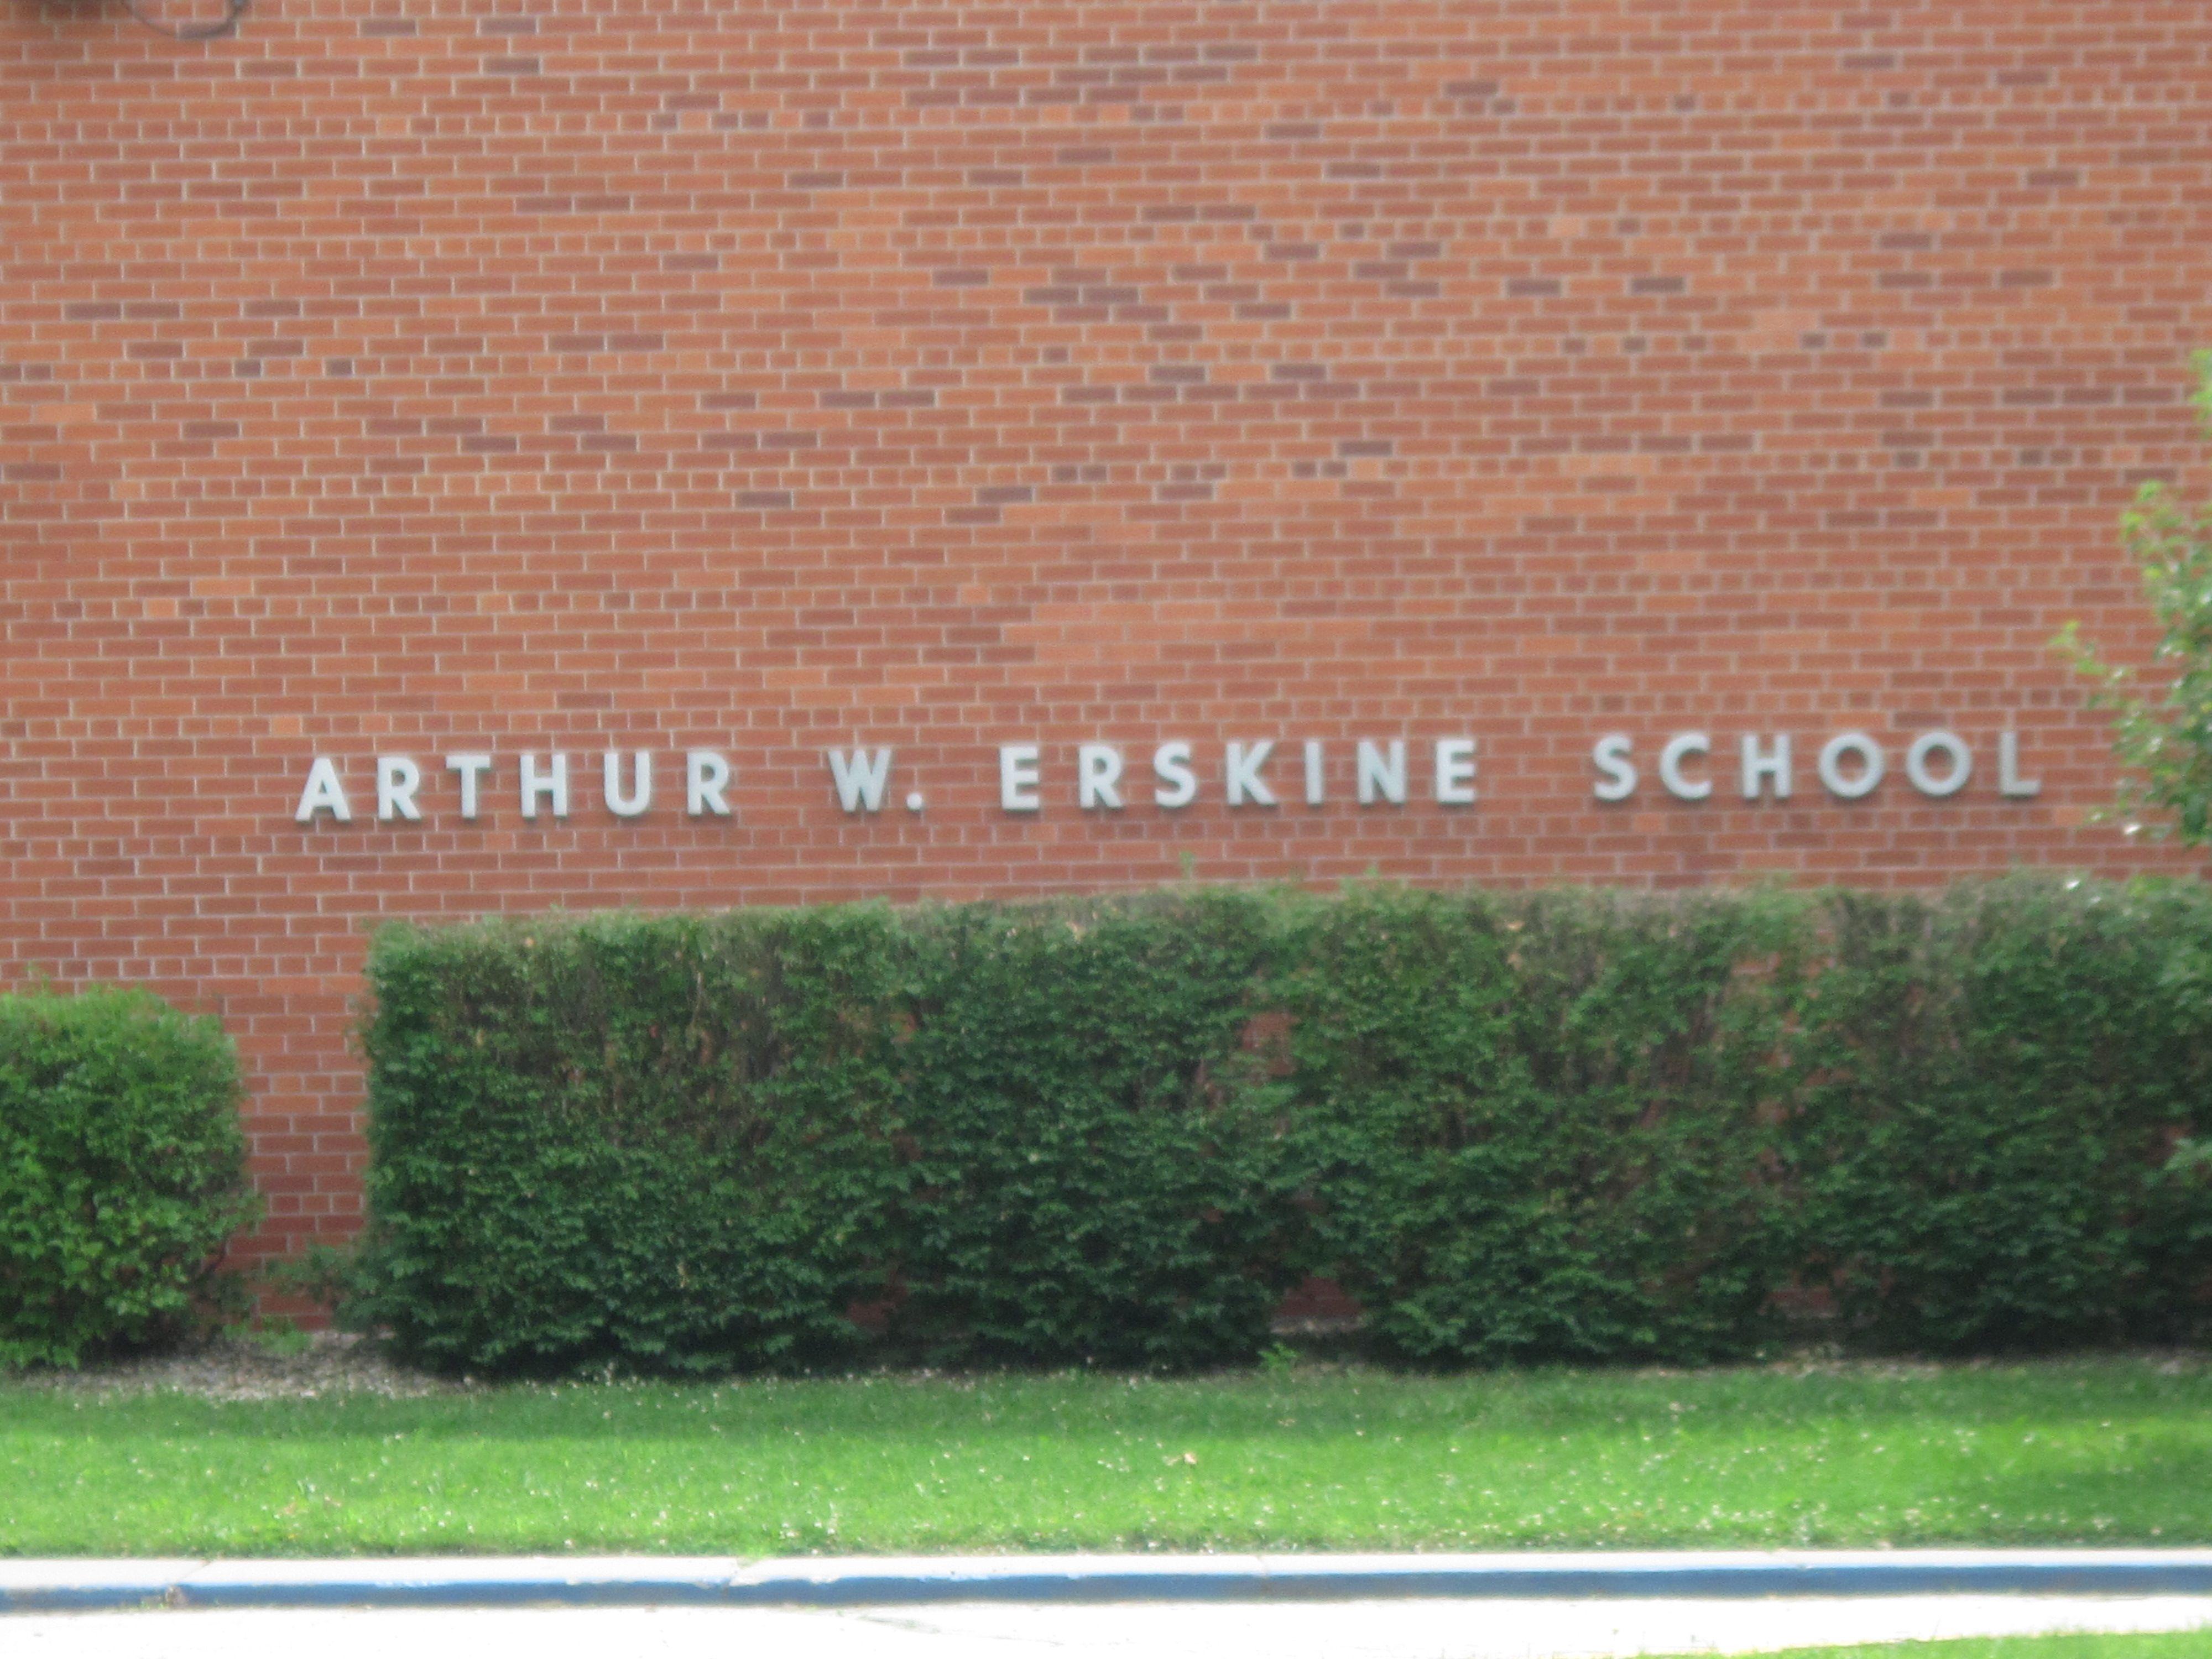 Erskine Elementary School Http Erskine Cr K12 Ia Us